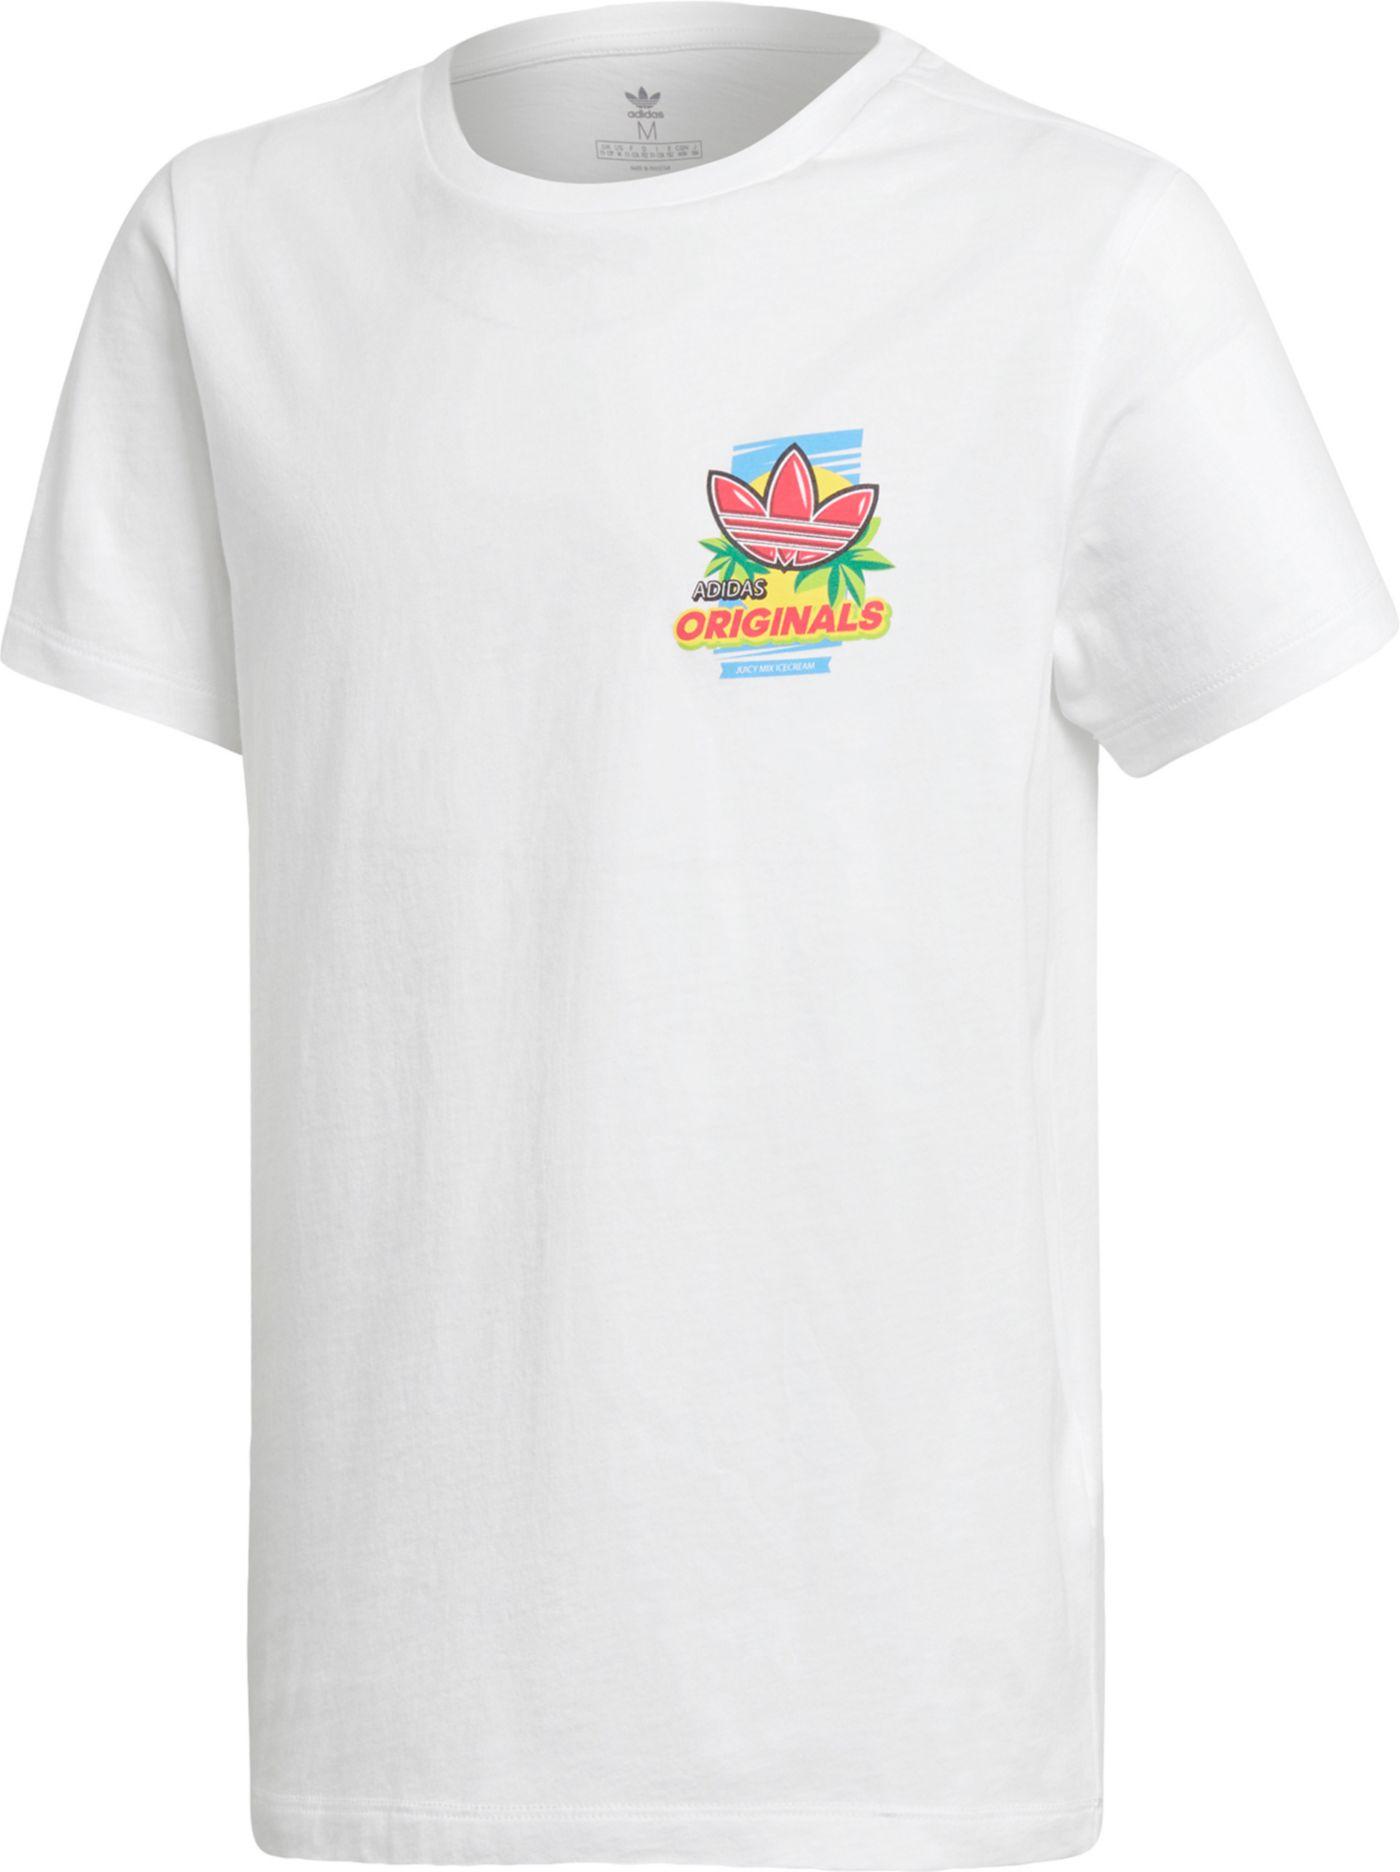 adidas Originals Boys' Ice Cream T-Shirt